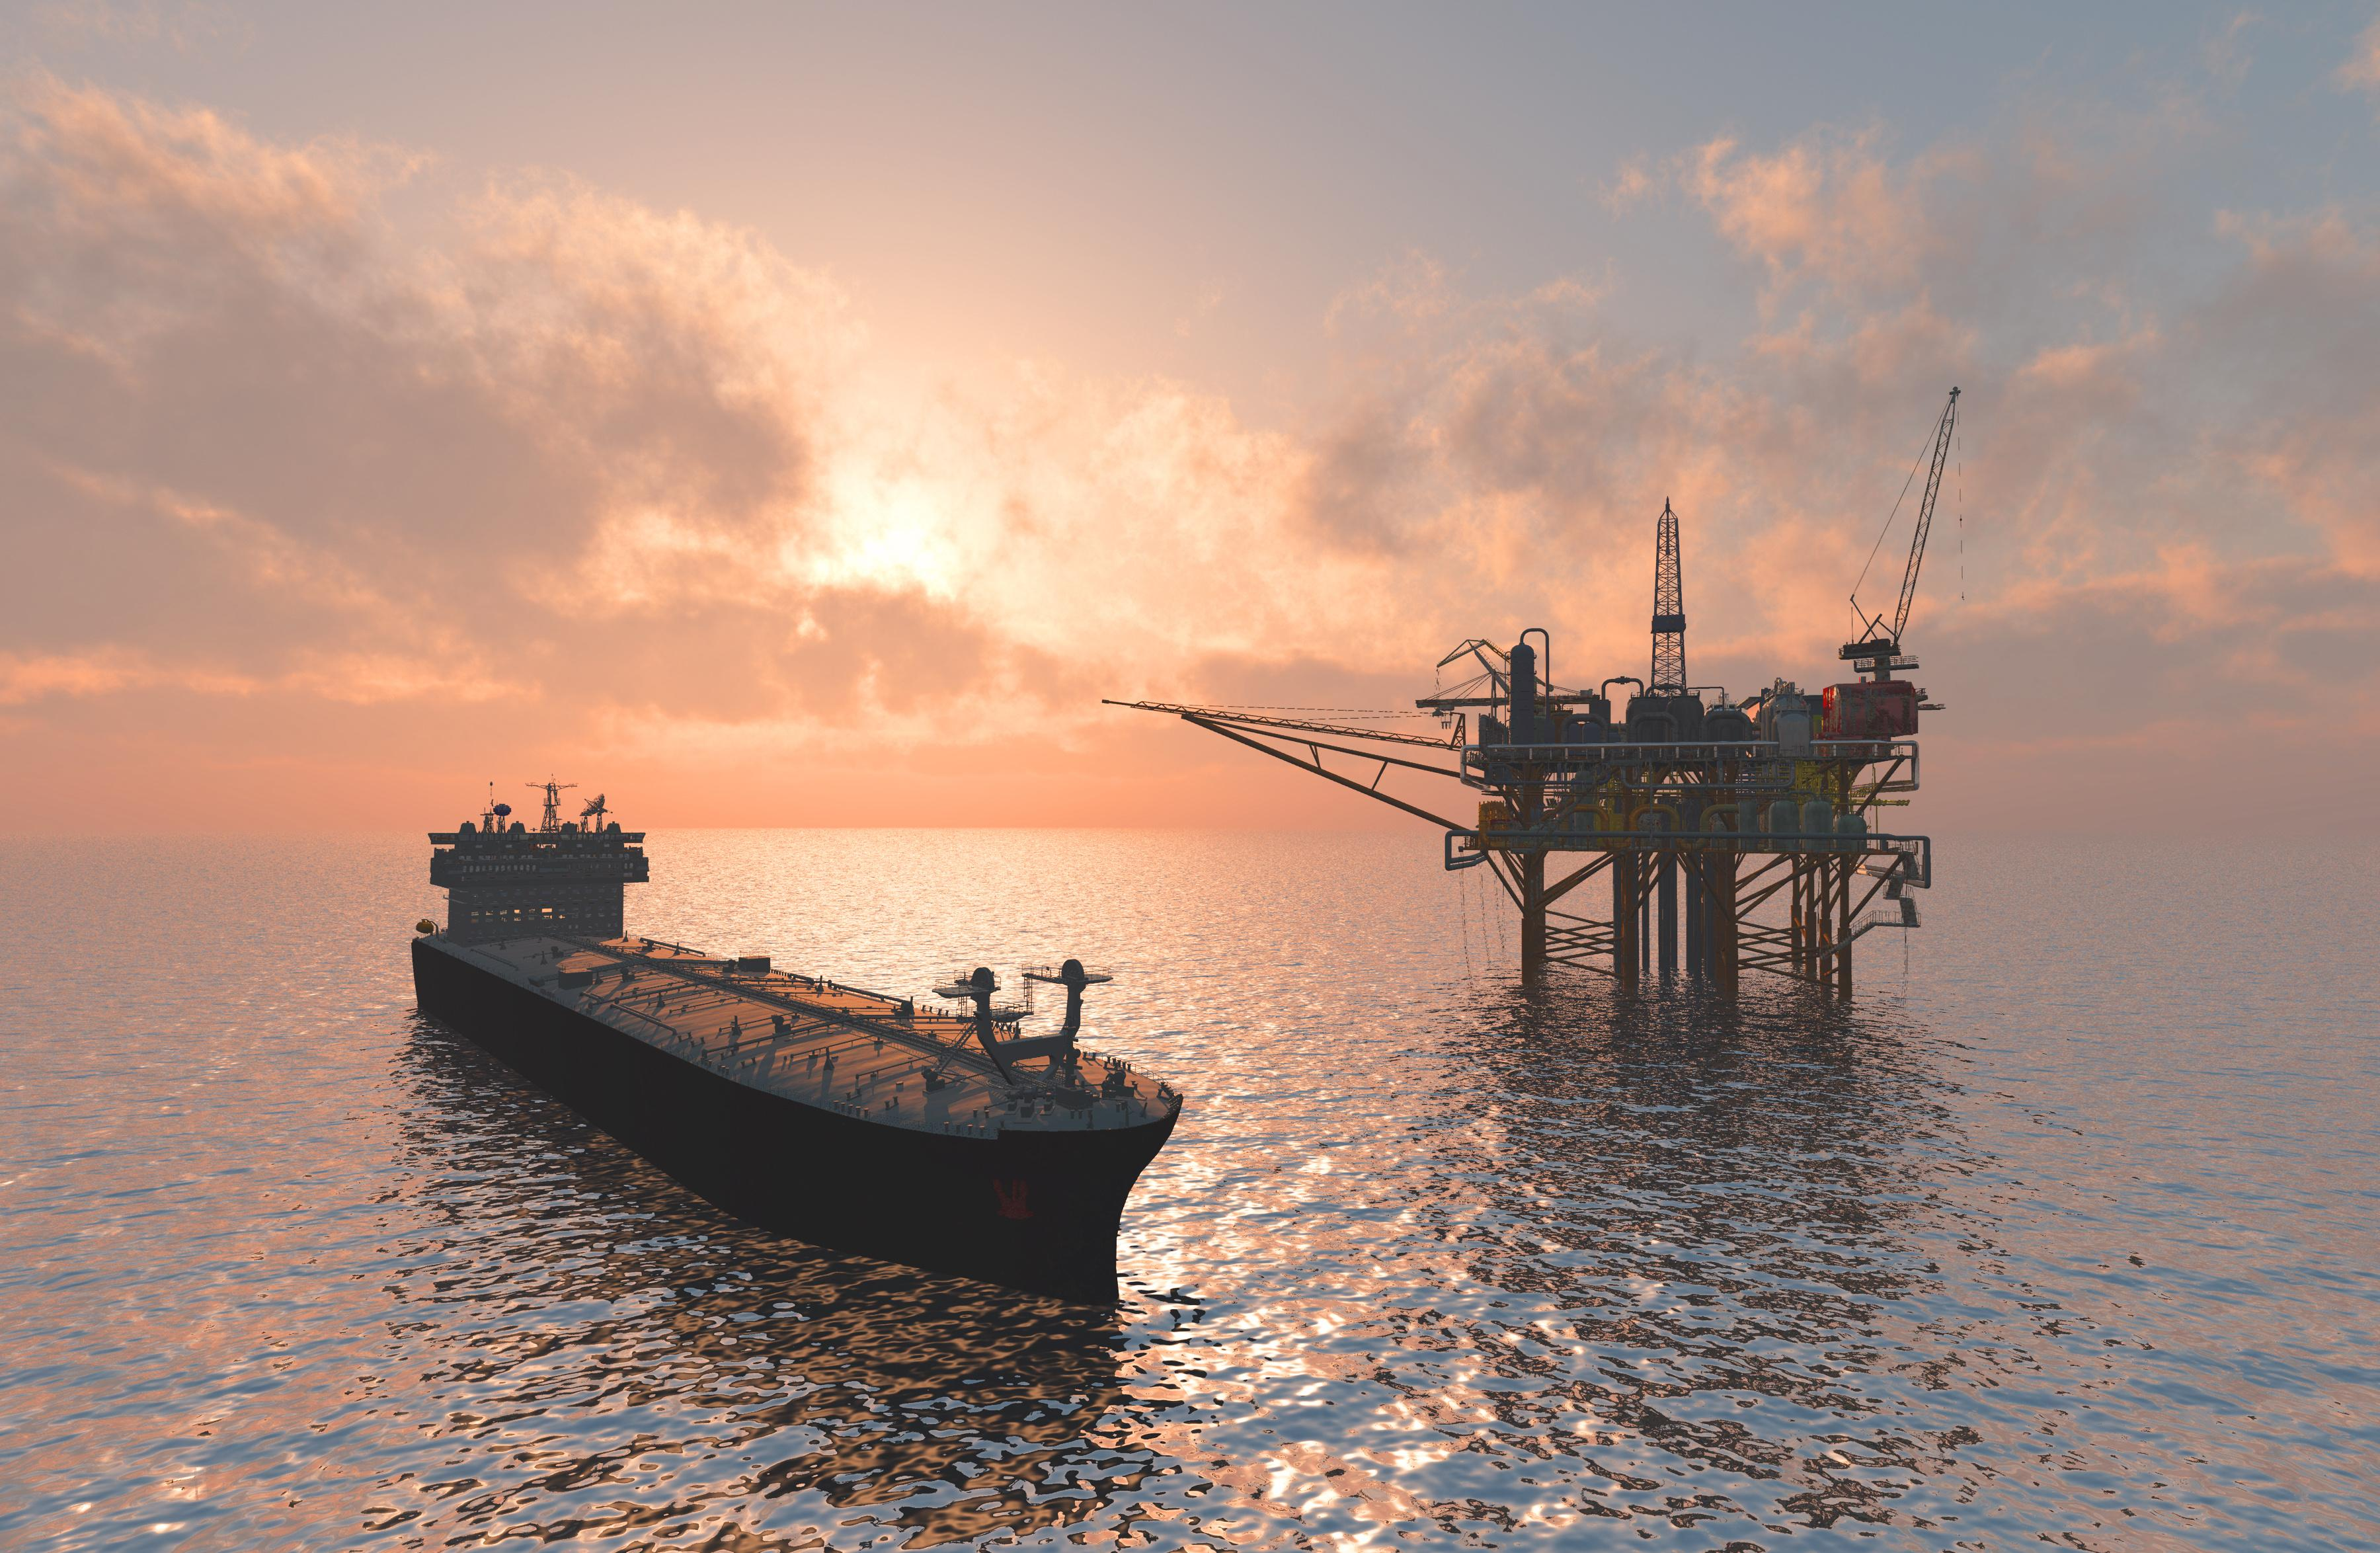 uploads///Us Iran oil stocks companies